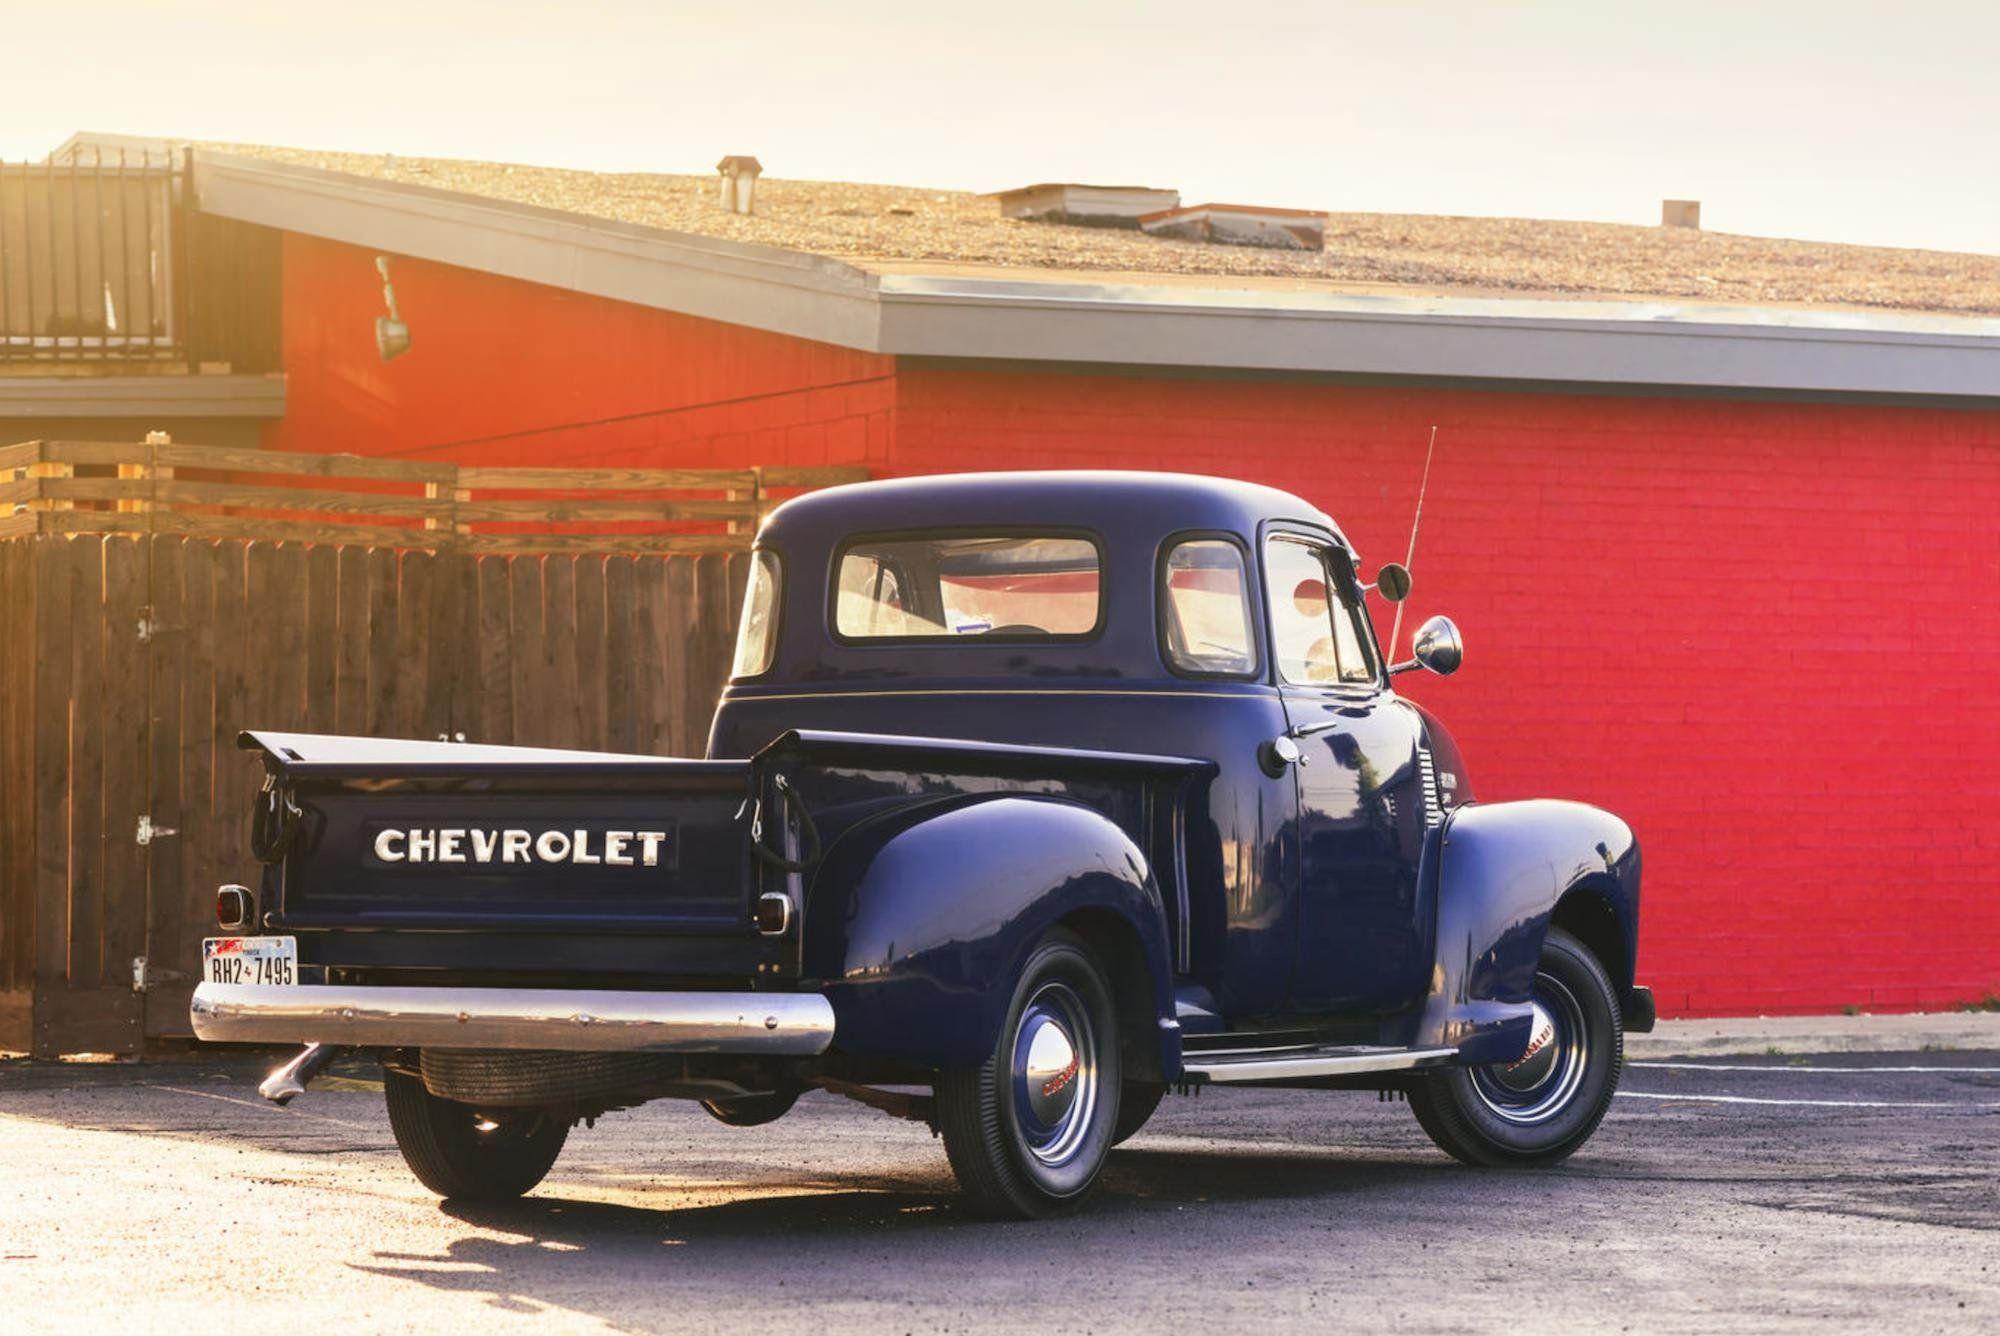 1951 Chevrolet 3100 Pickup Retro Wallpaper 2000x1336 484072 Wallpaperup Pickup Trucks American Pickup Trucks Chevy Trucks